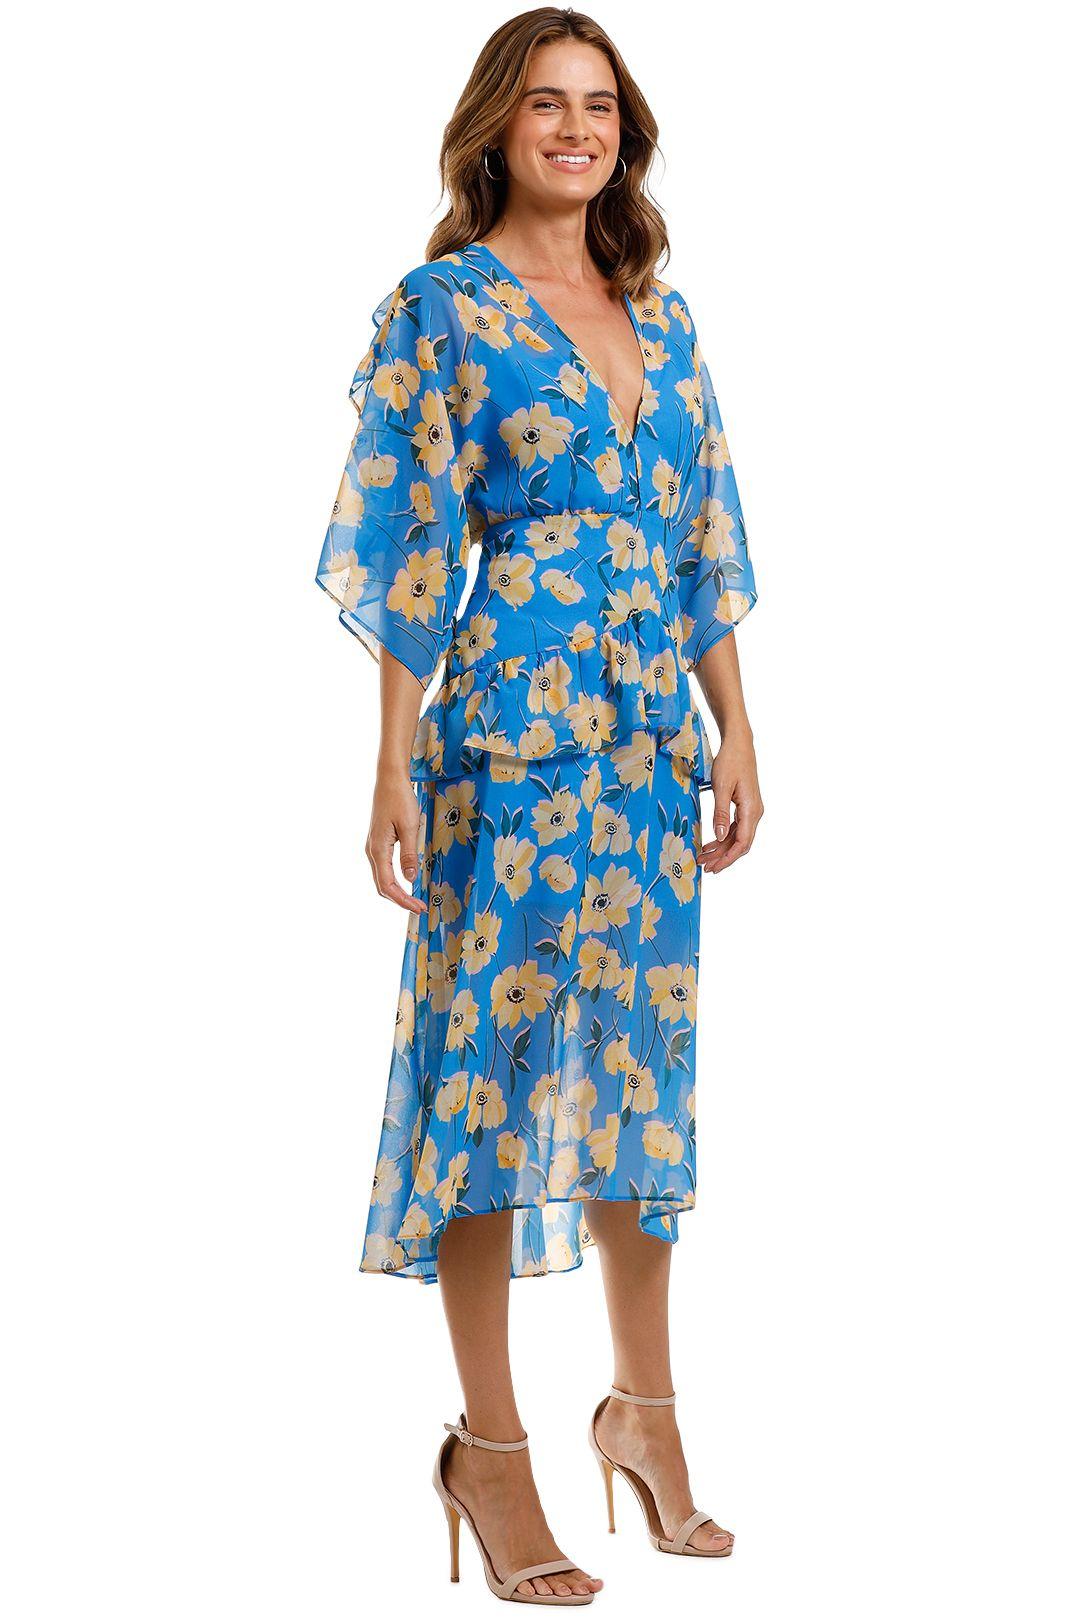 Talulah Sicily Sway Midi Dress v neckline